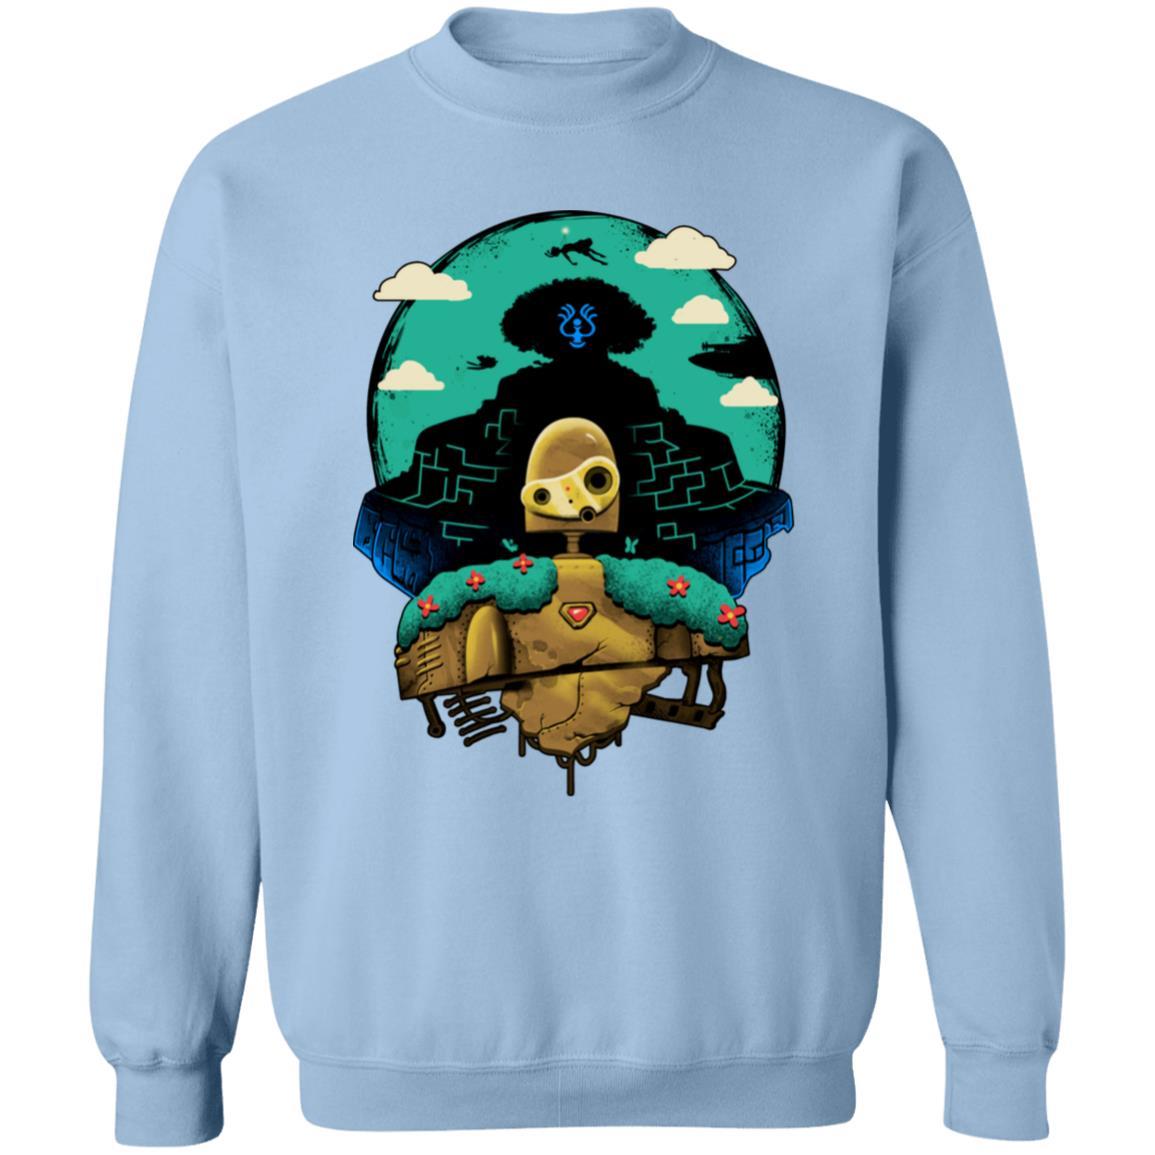 Laputa: Castle in The Sky and Warrior Robot Sweatshirt